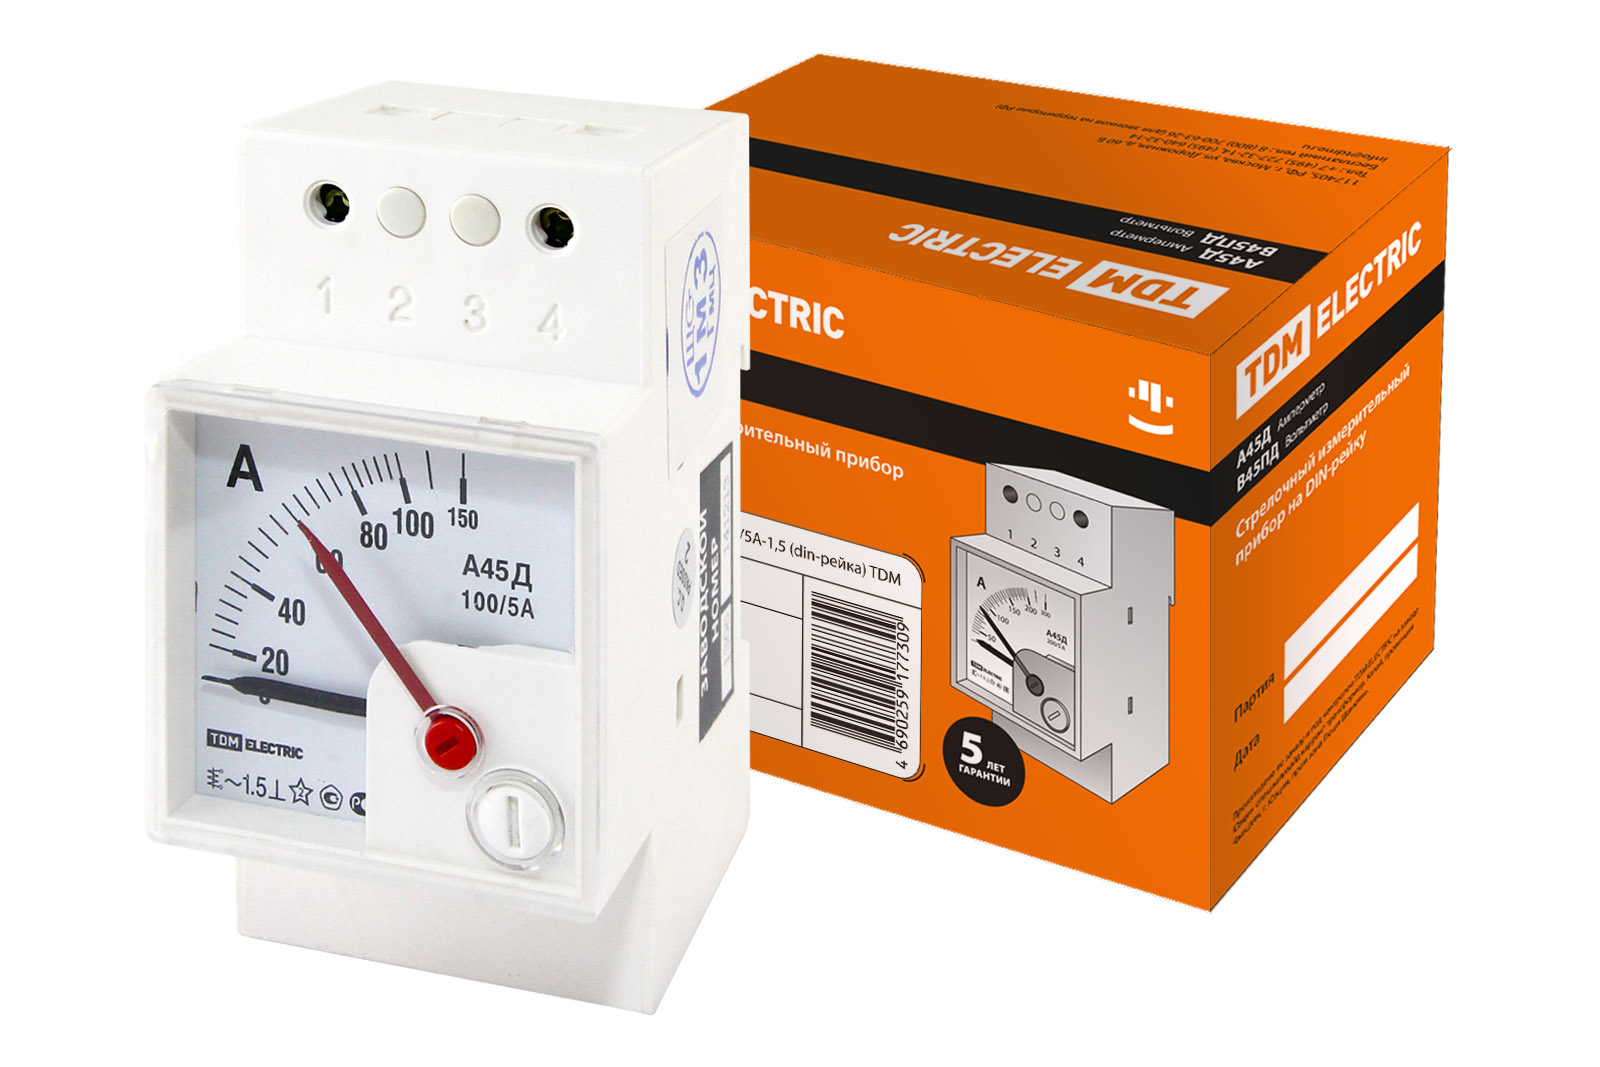 Амперметр А45Д 100/5А-1,5 (din-рейка) TDM SQ1102-0301 TDM Electric